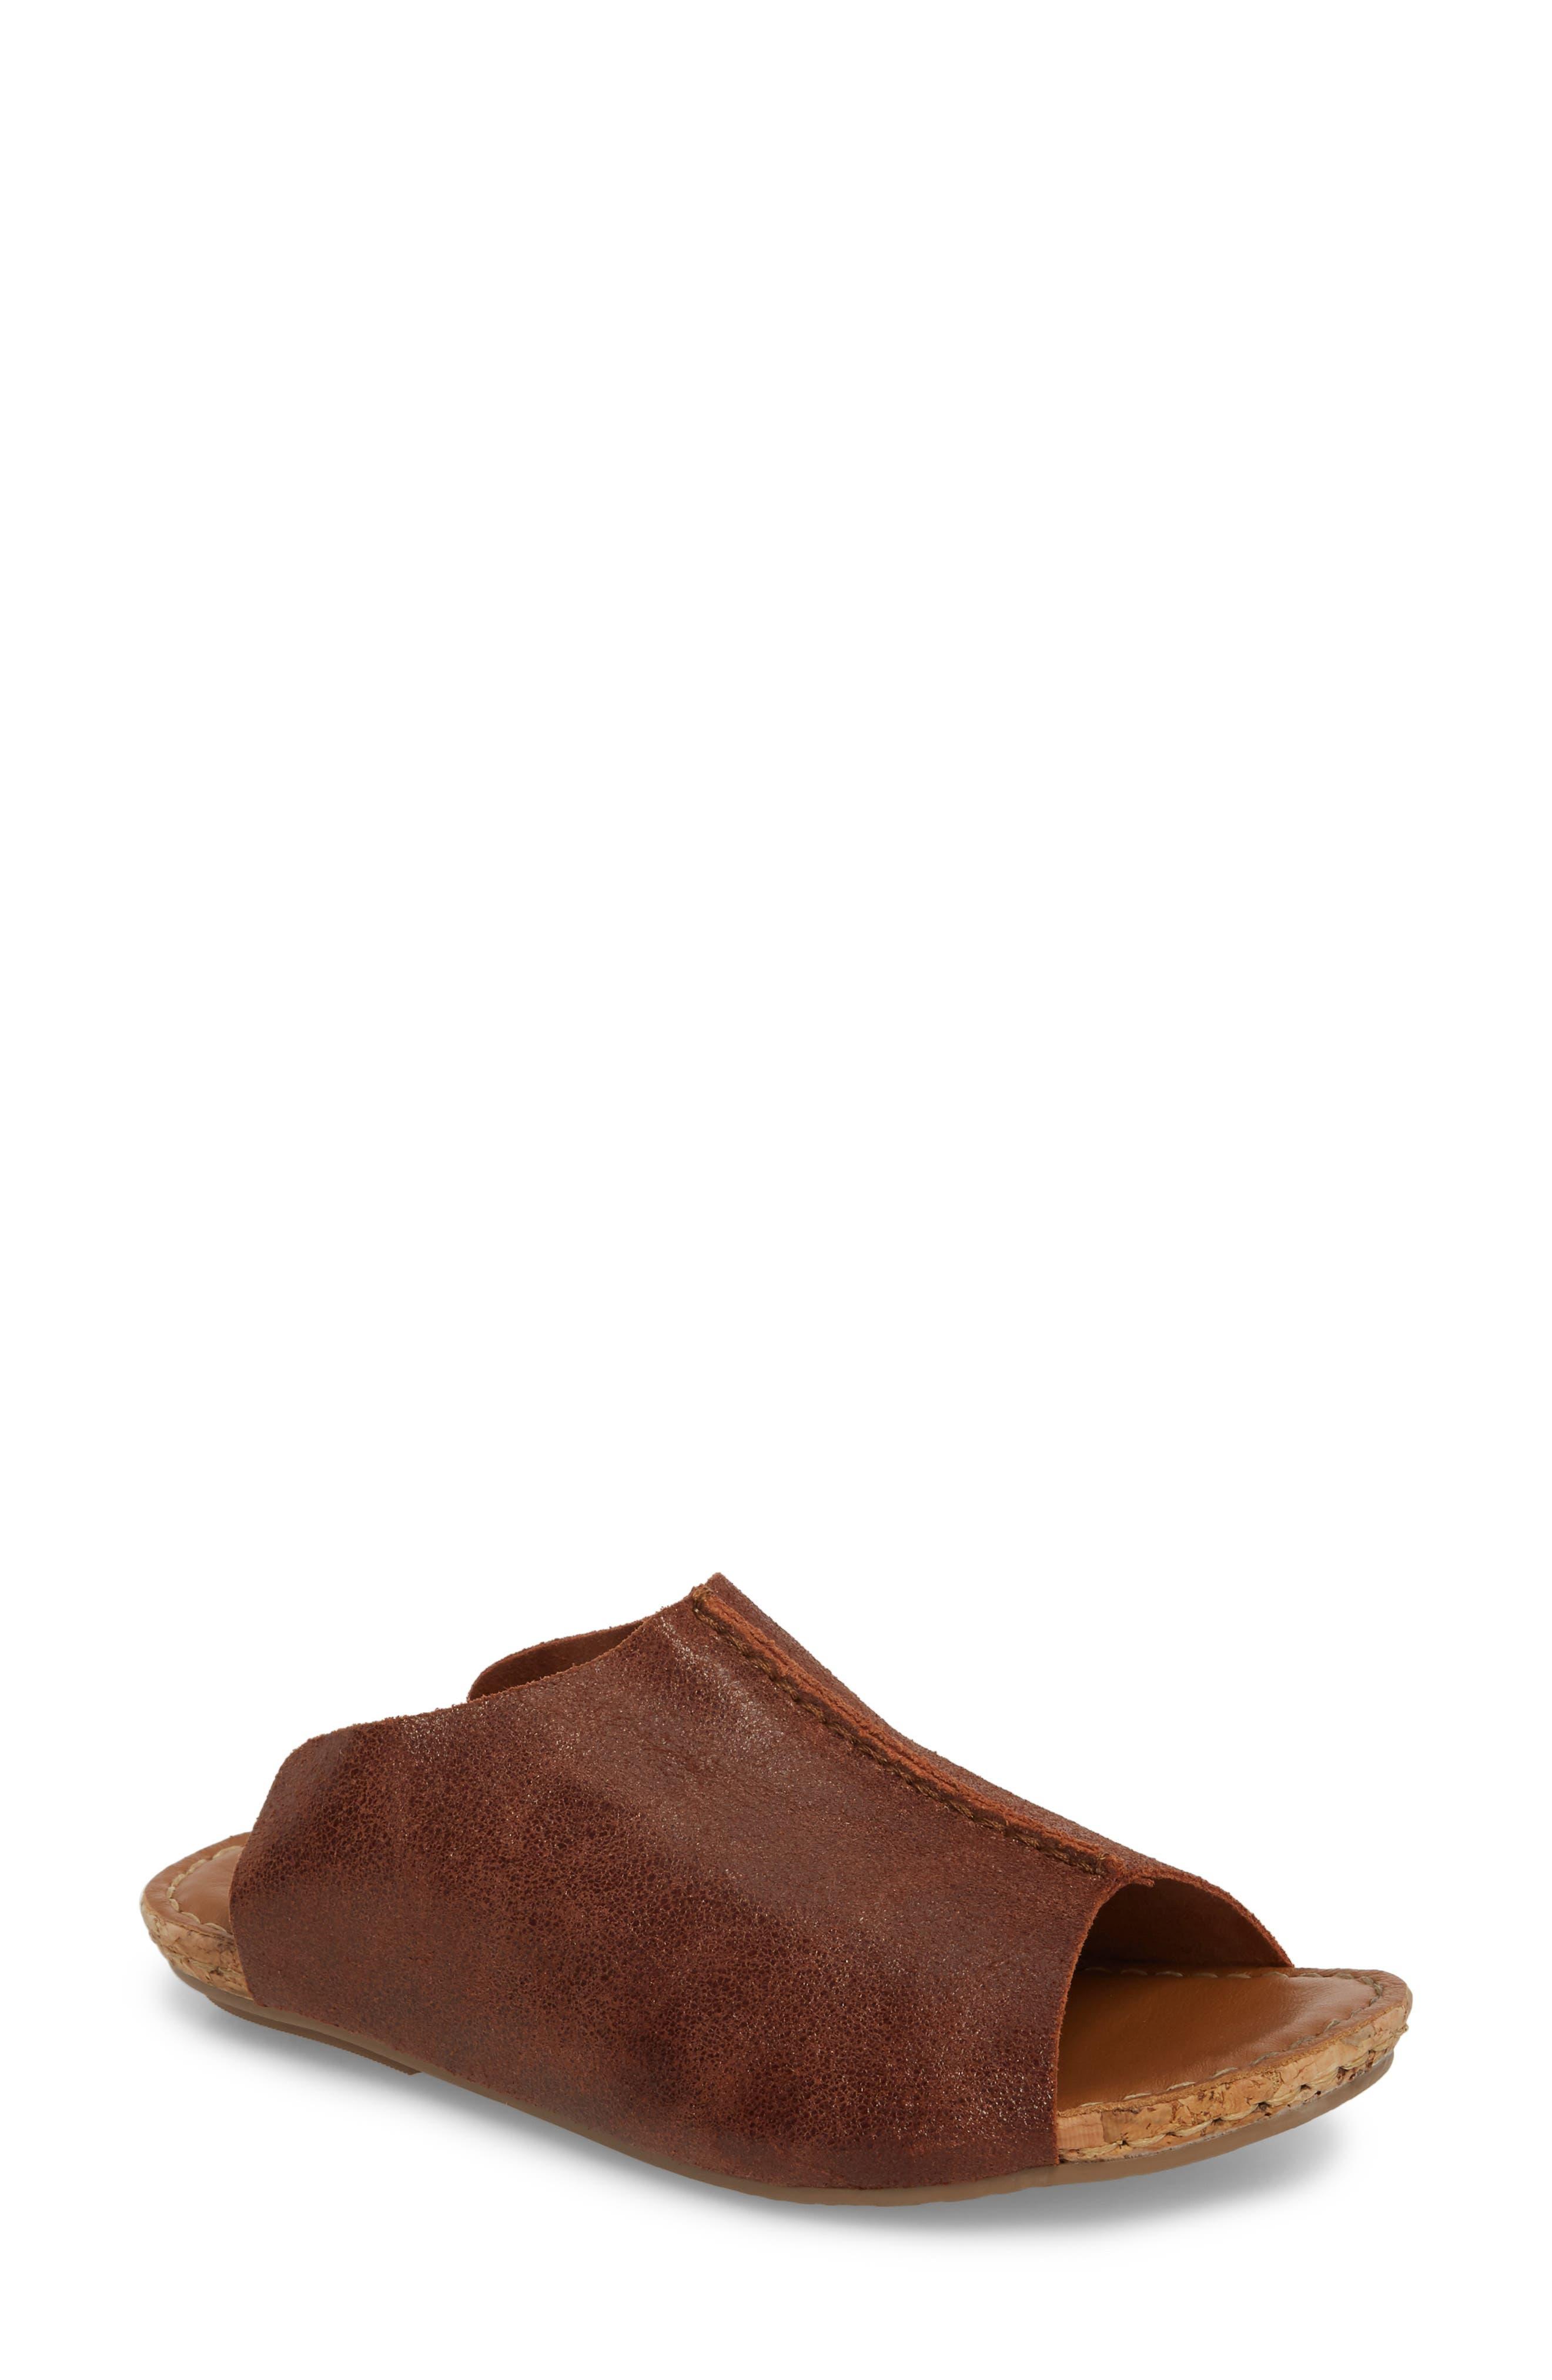 Gracey Slide Sandal,                             Main thumbnail 1, color,                             Rum Leather